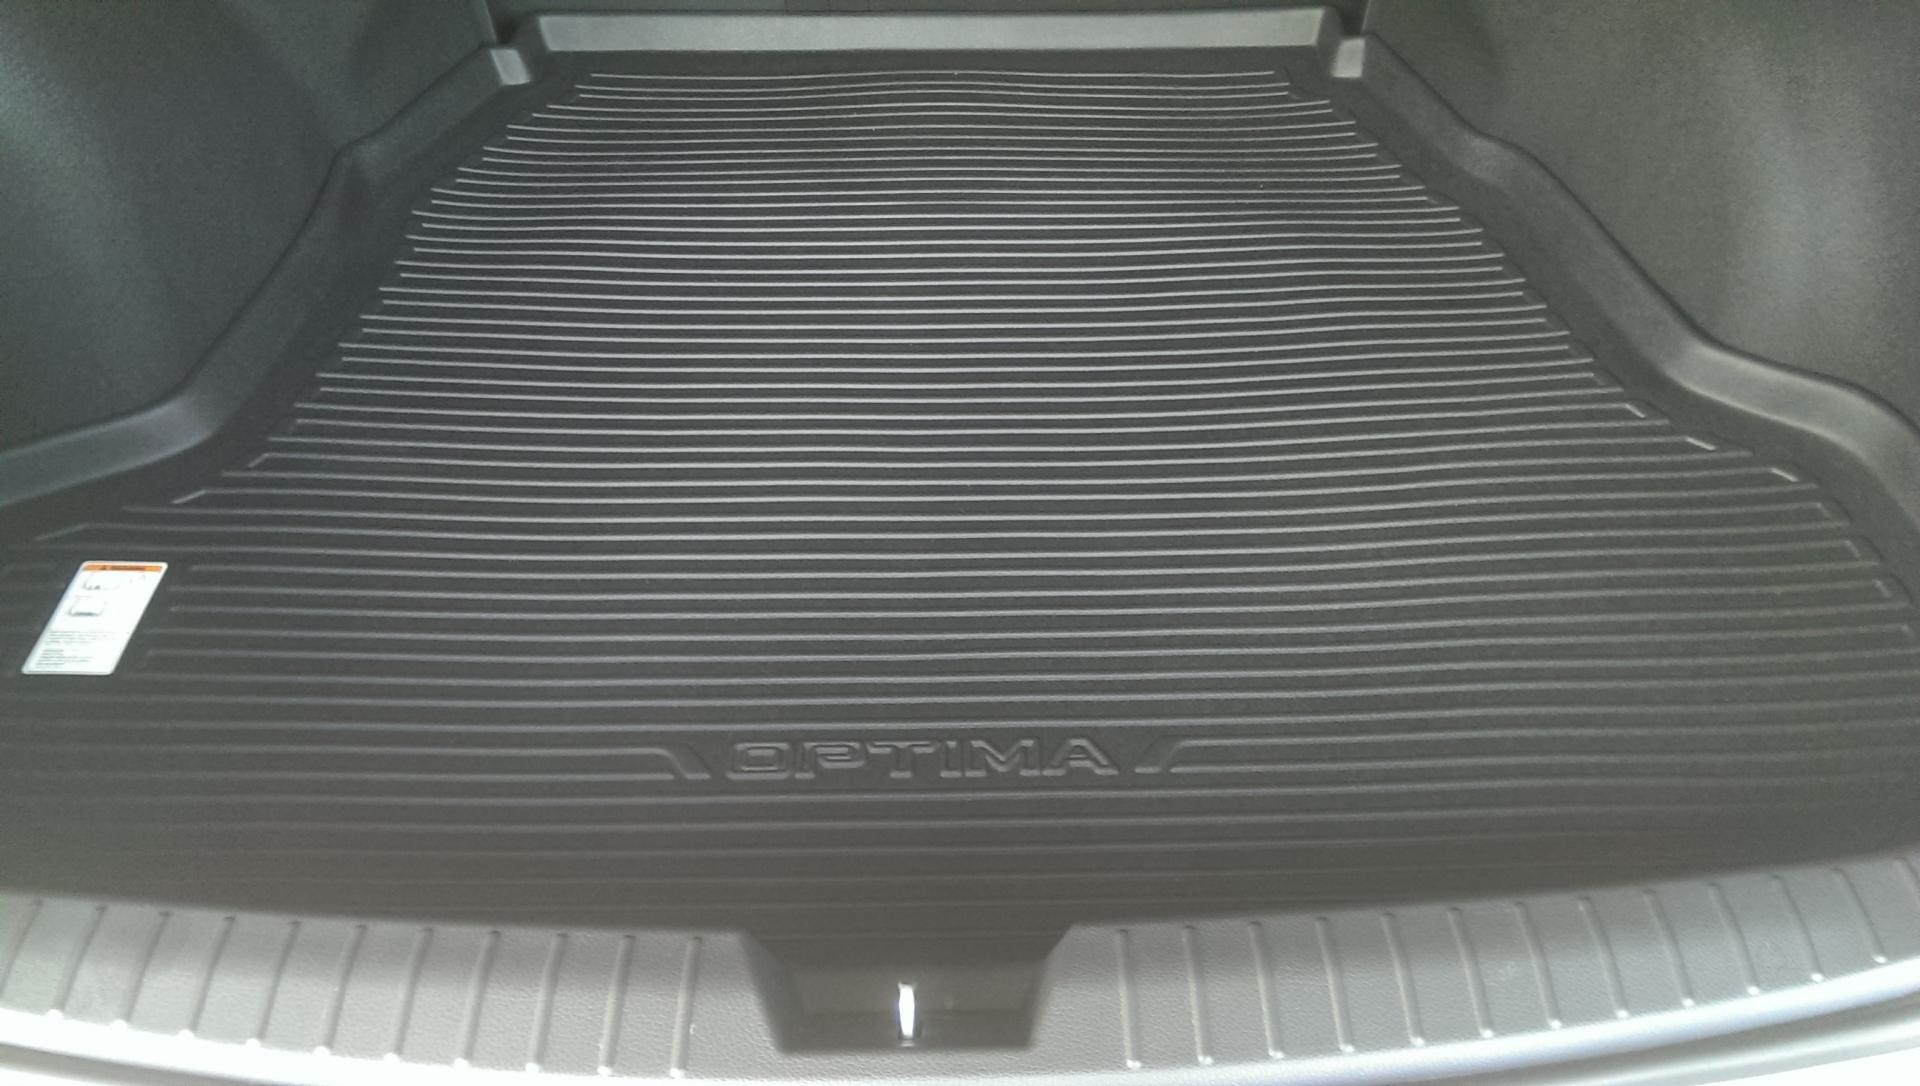 Weathertech floor mats ontario - Weathertech Digitalfit All Season Mats Front Rear And Trunk Too 2013